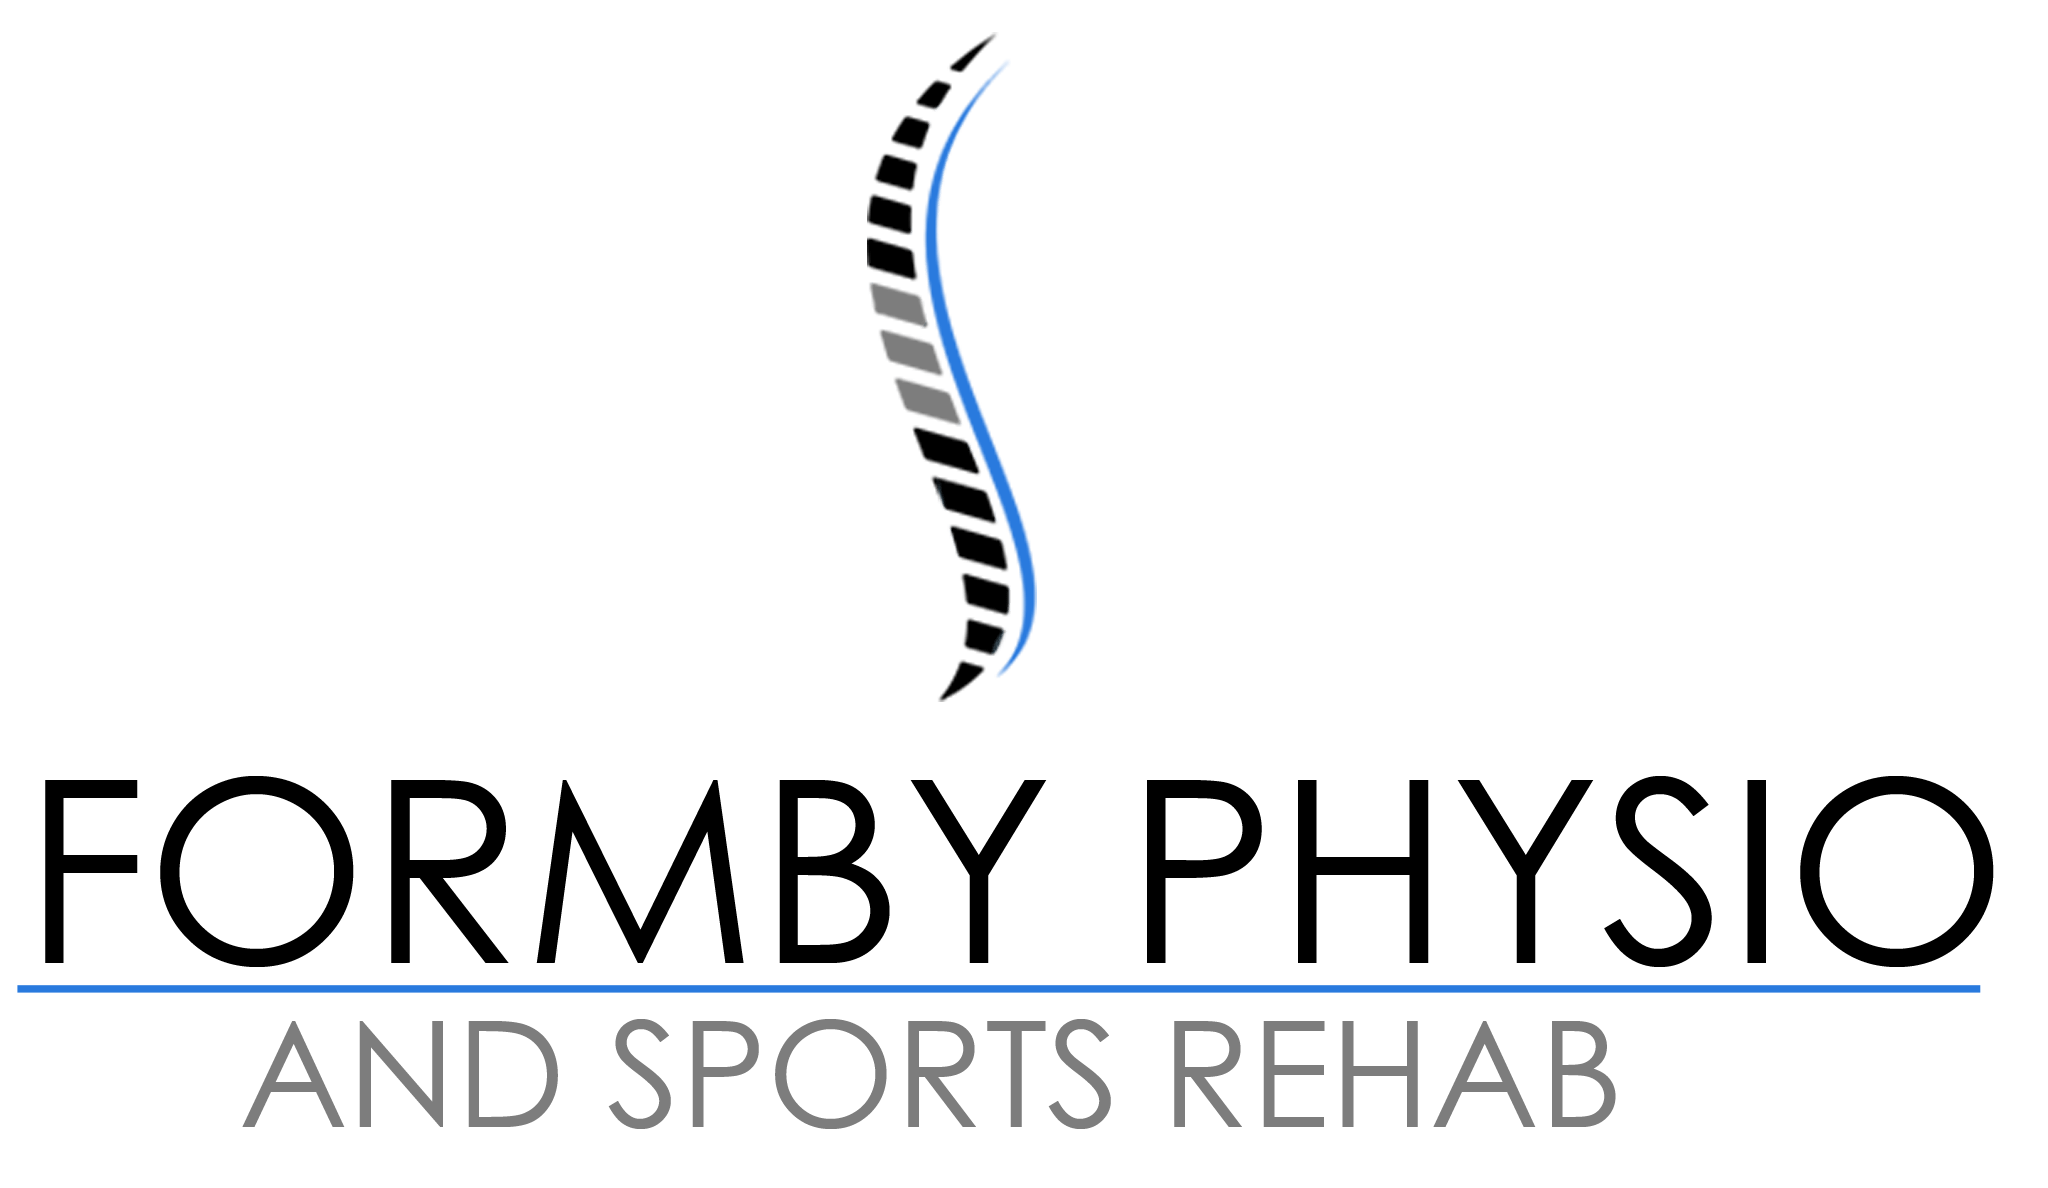 Formby Physio and Sports Rehab